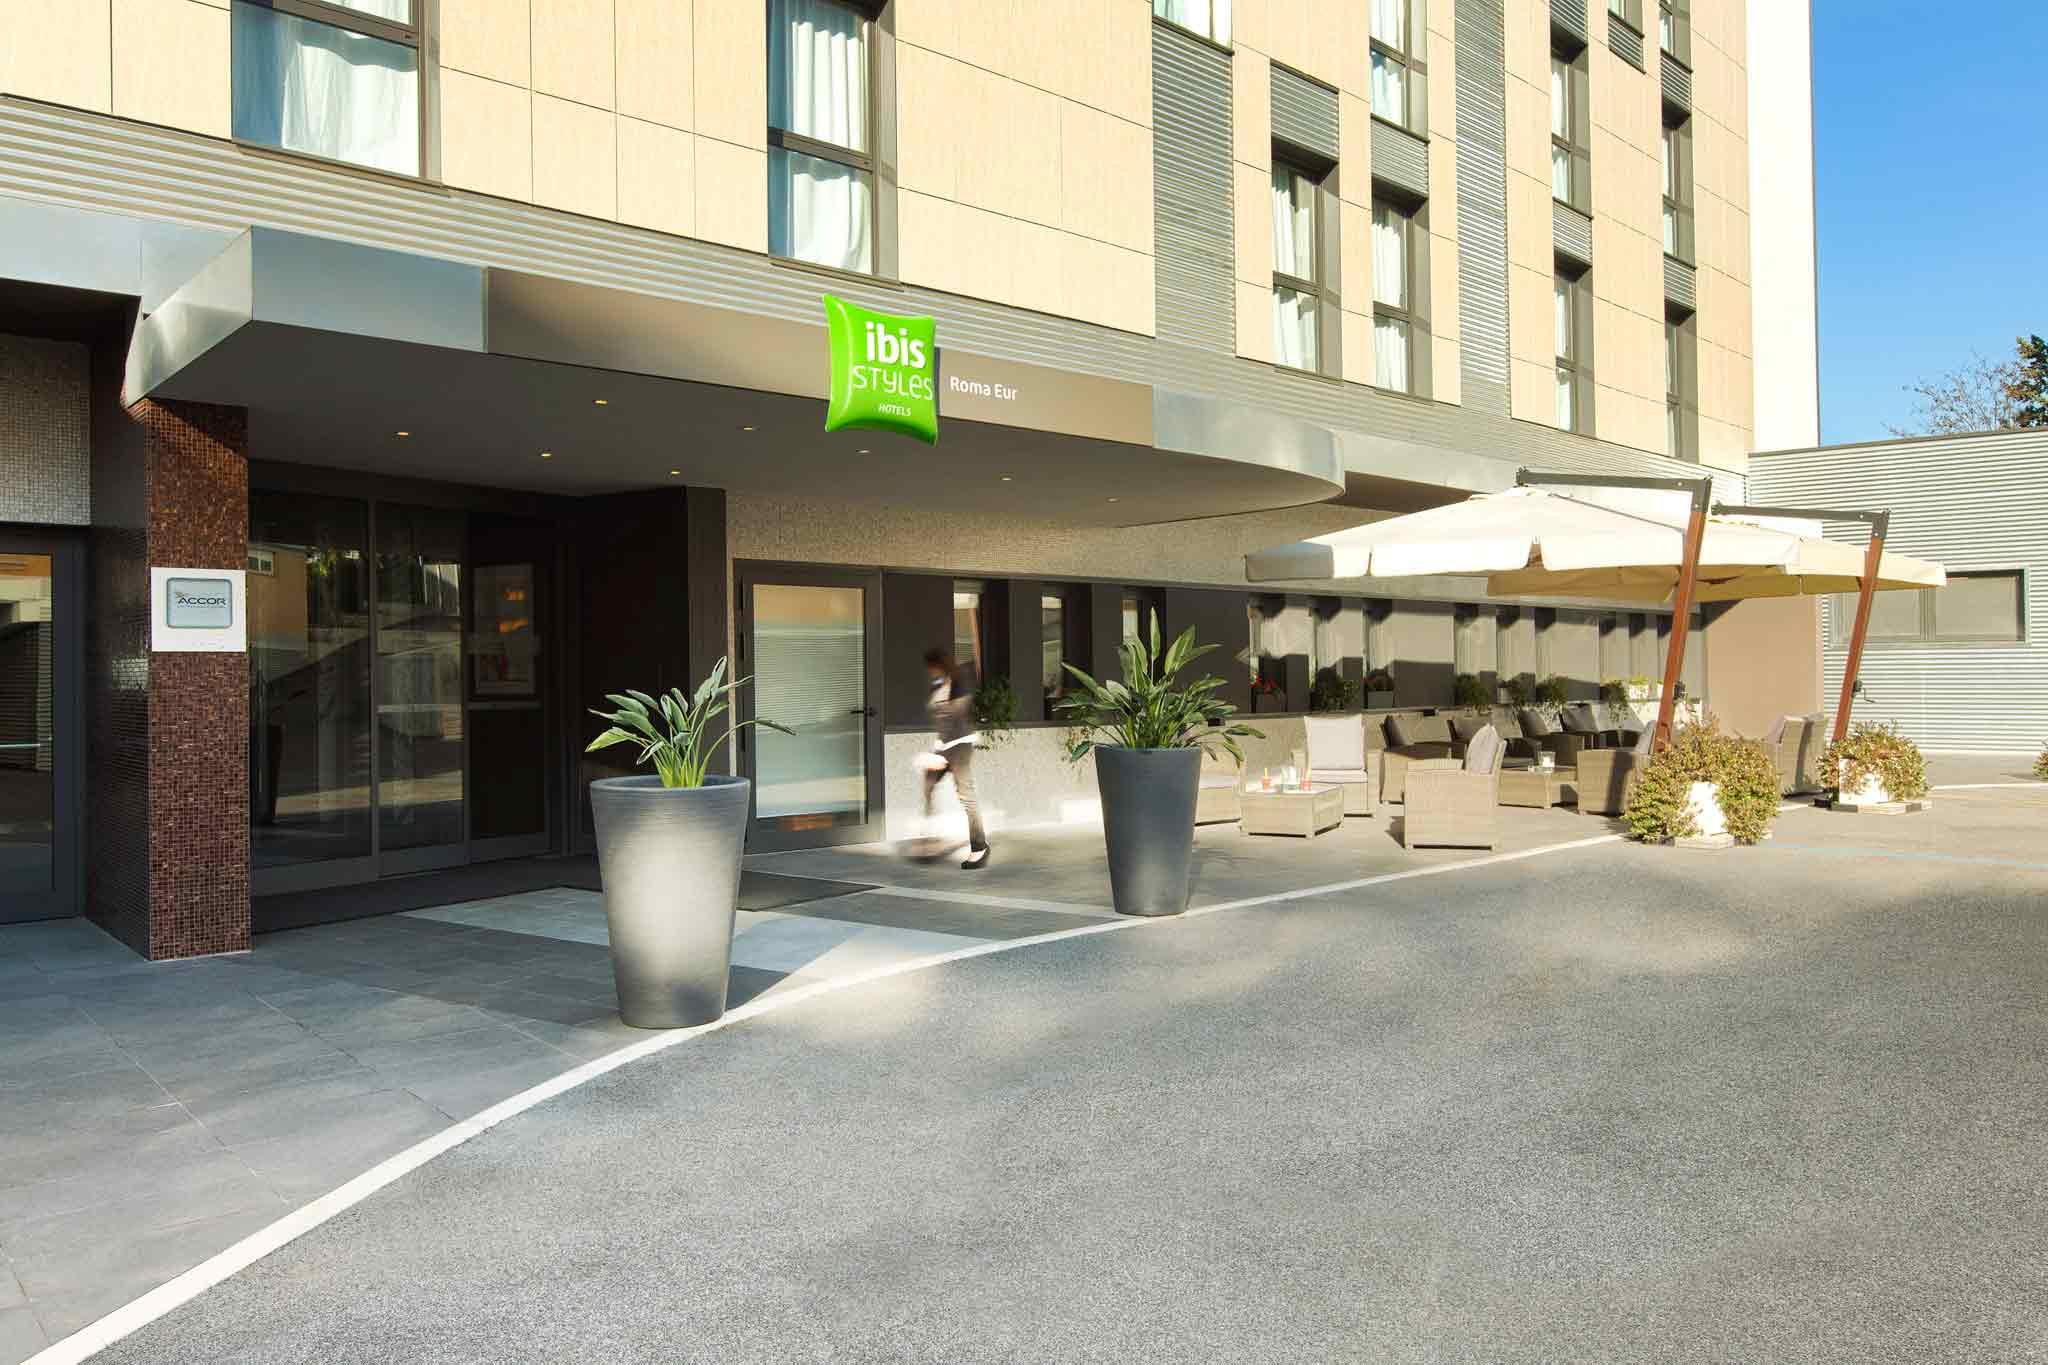 Hotel – ibis Styles Rome Eur